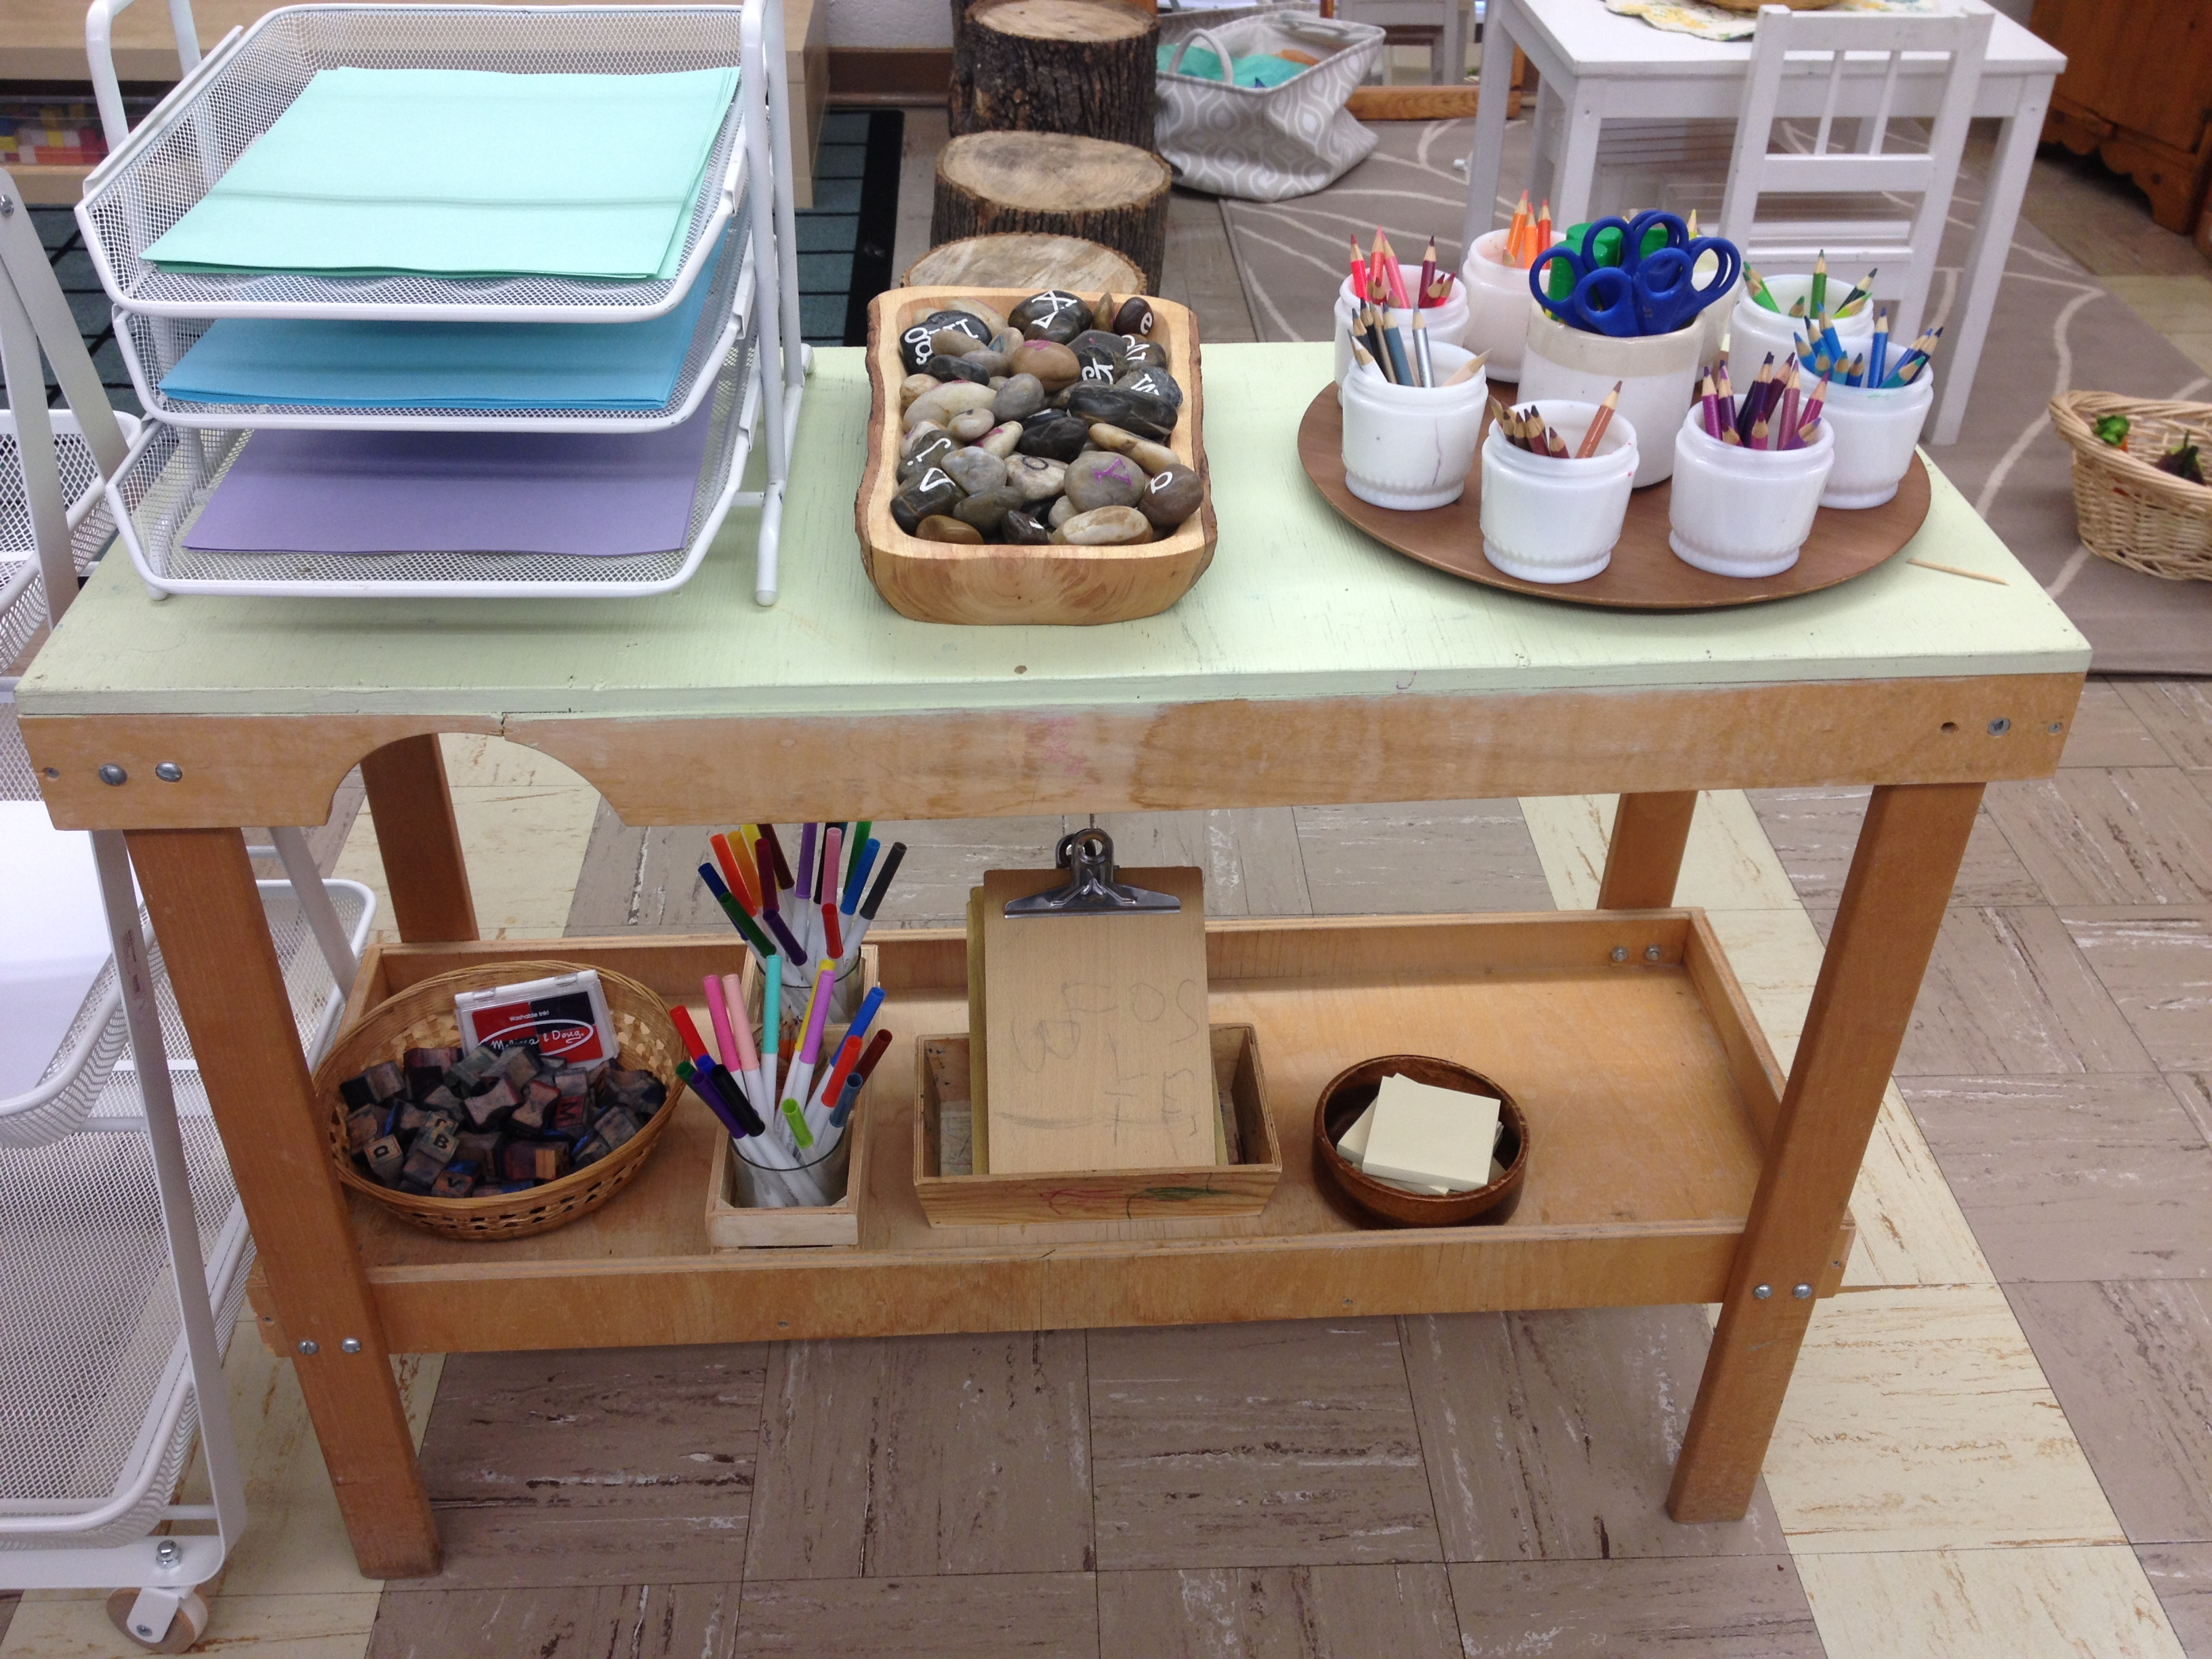 Kinder Garden: Reggio Inspired Classroom Setup